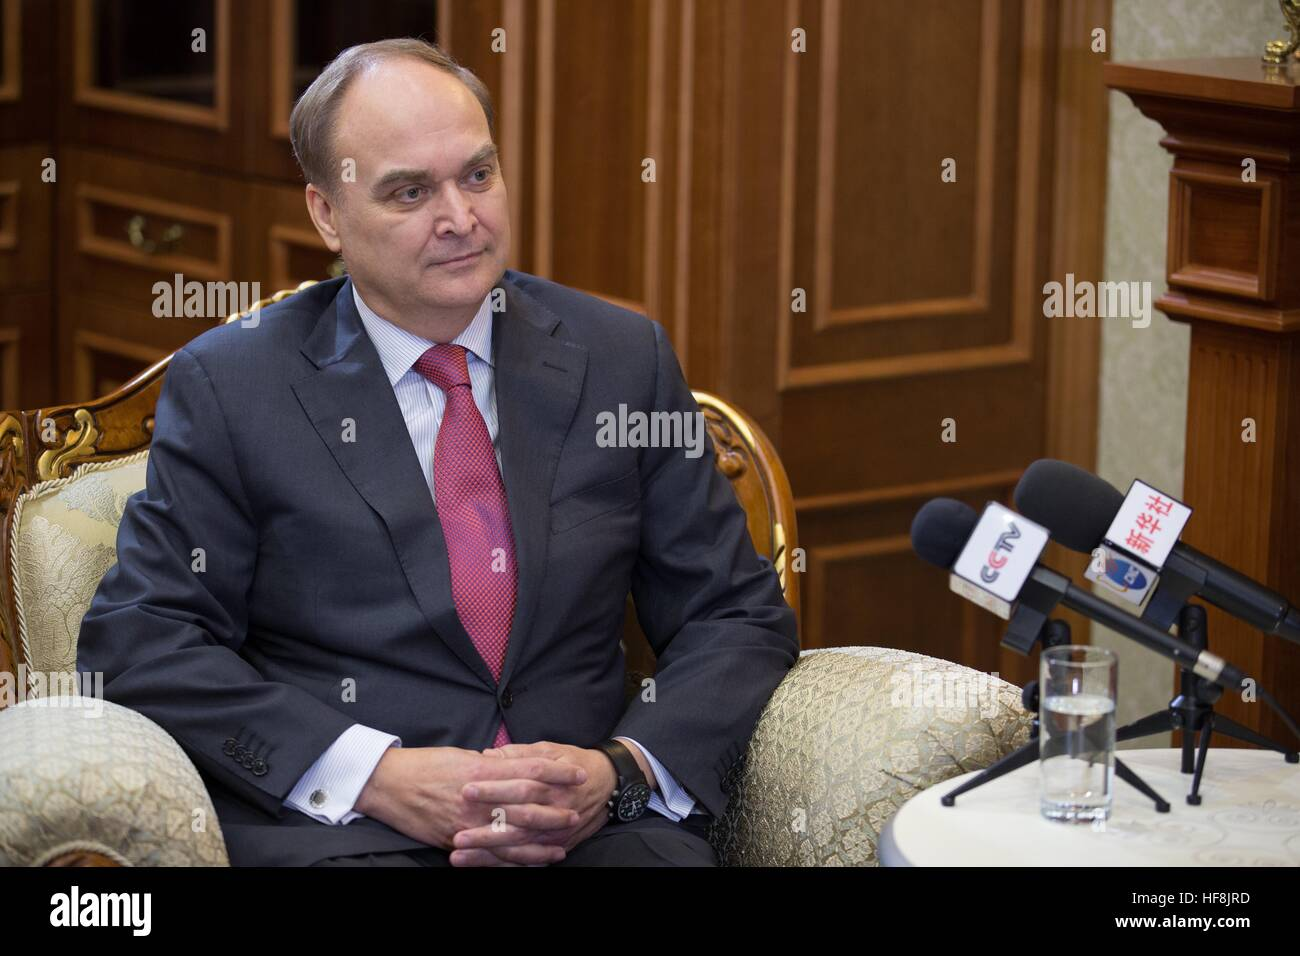 Yuriy Antonov was congratulated by Medvedev and Putin on 02/19/2015